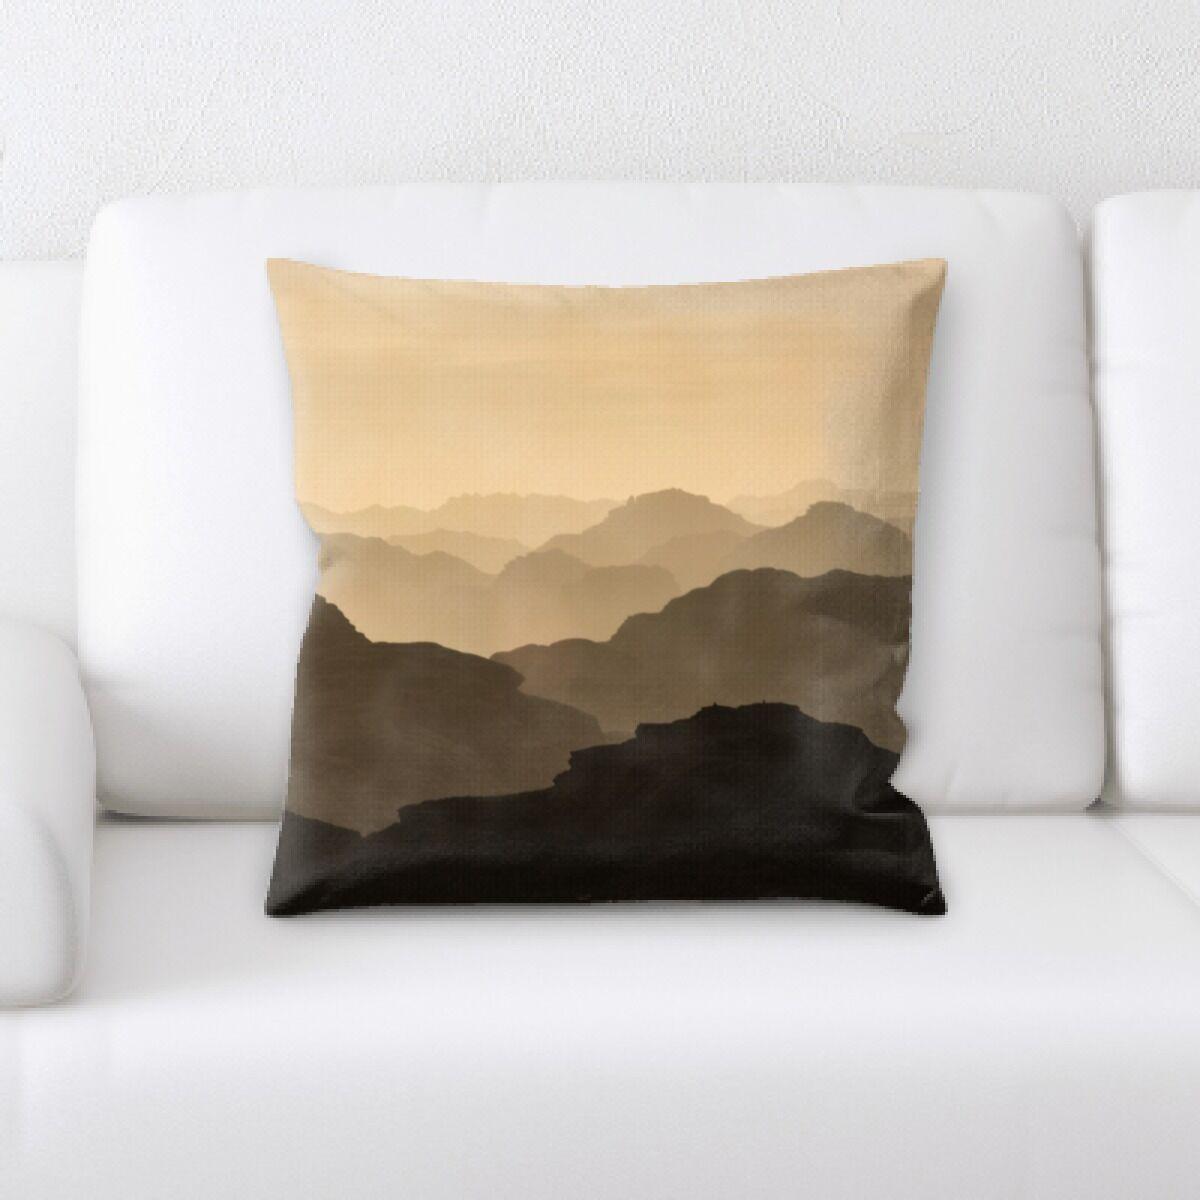 Oneybrook Mountain and Cliffs (142) Throw Pillow